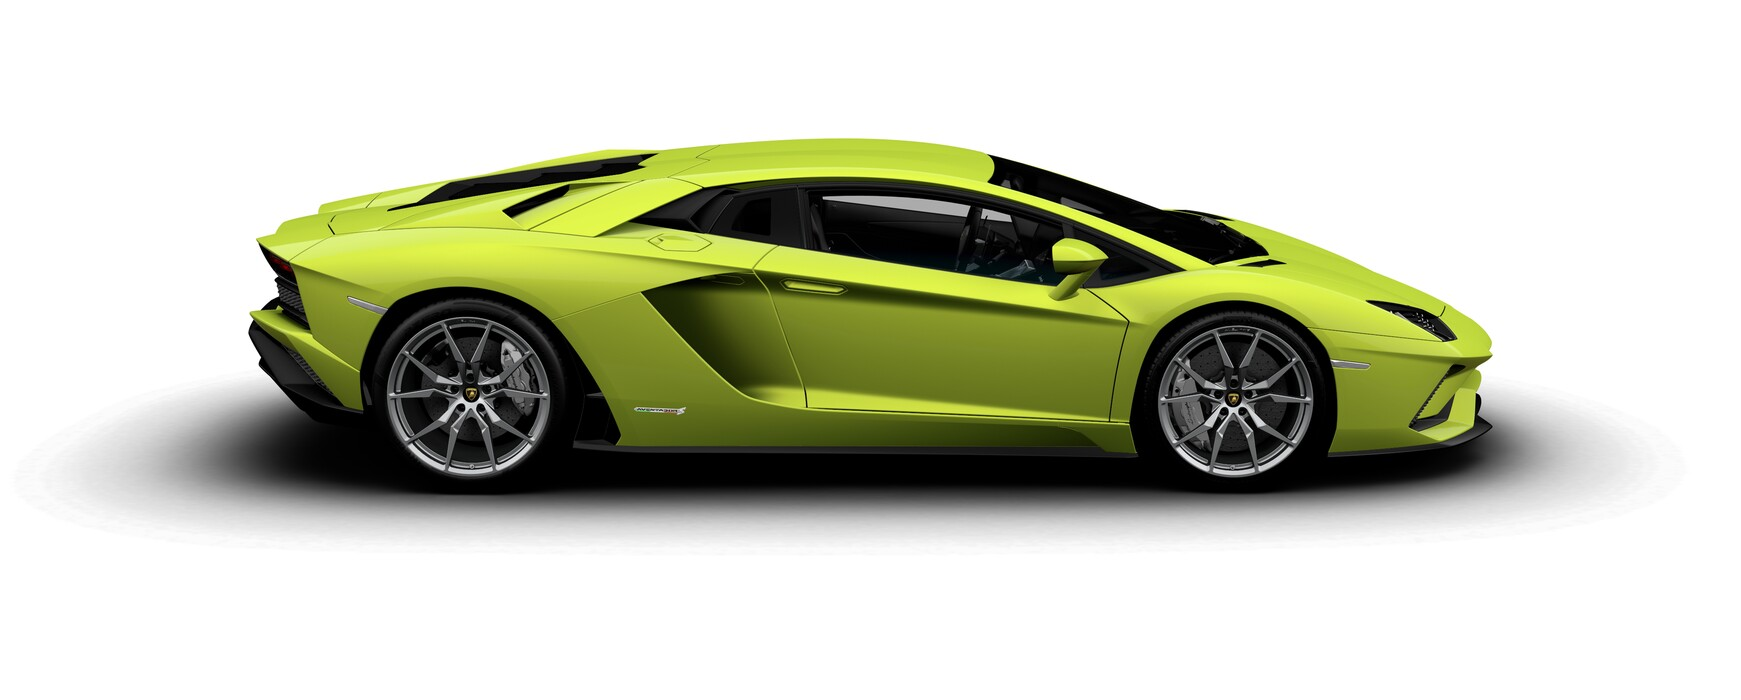 Lamborghini Aventador S Coupe gloss Verde Scandal side view